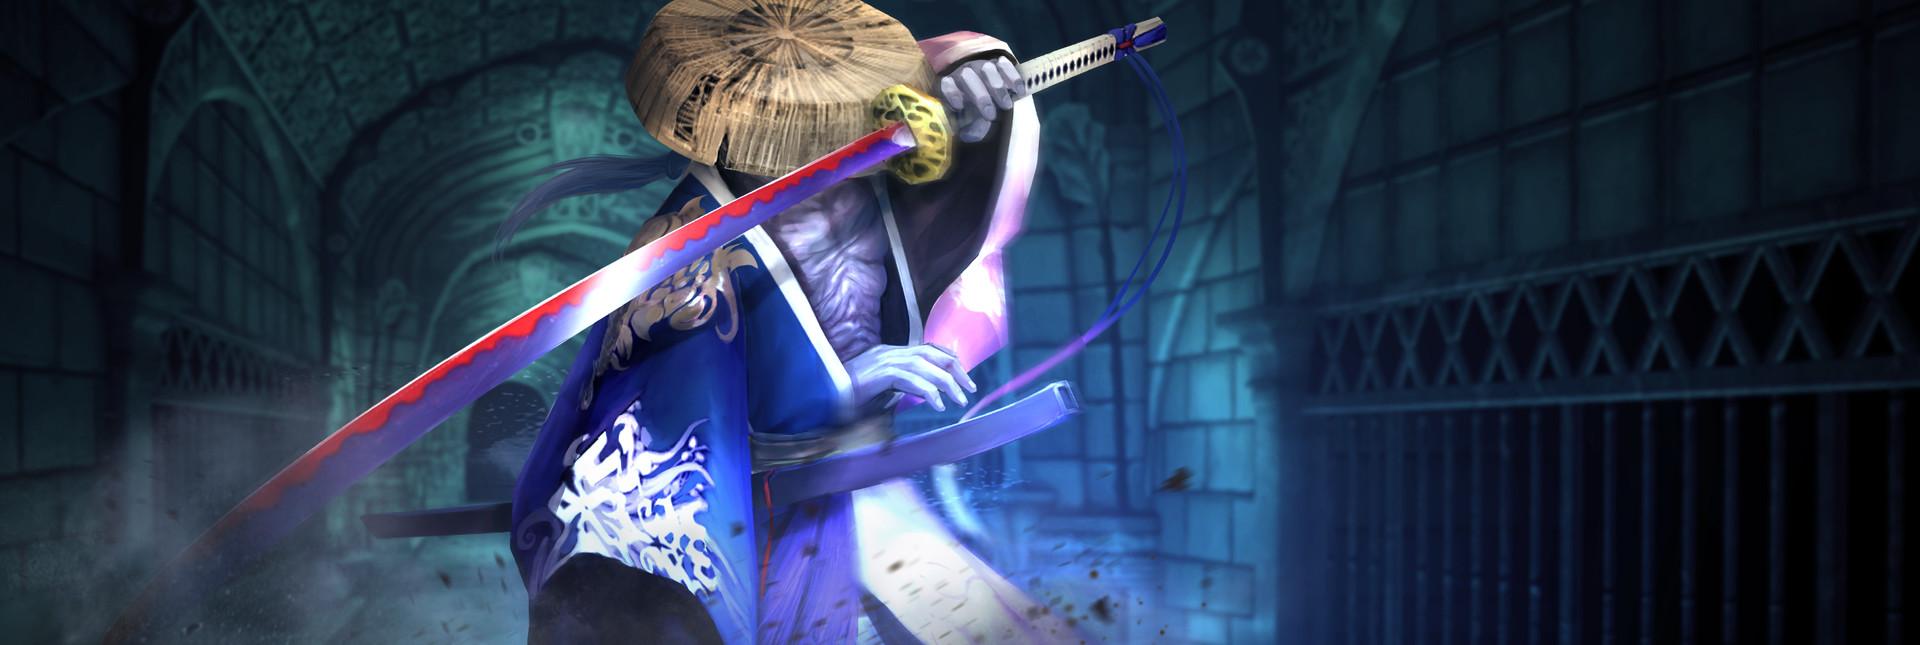 artstation final fantasy yojimbo